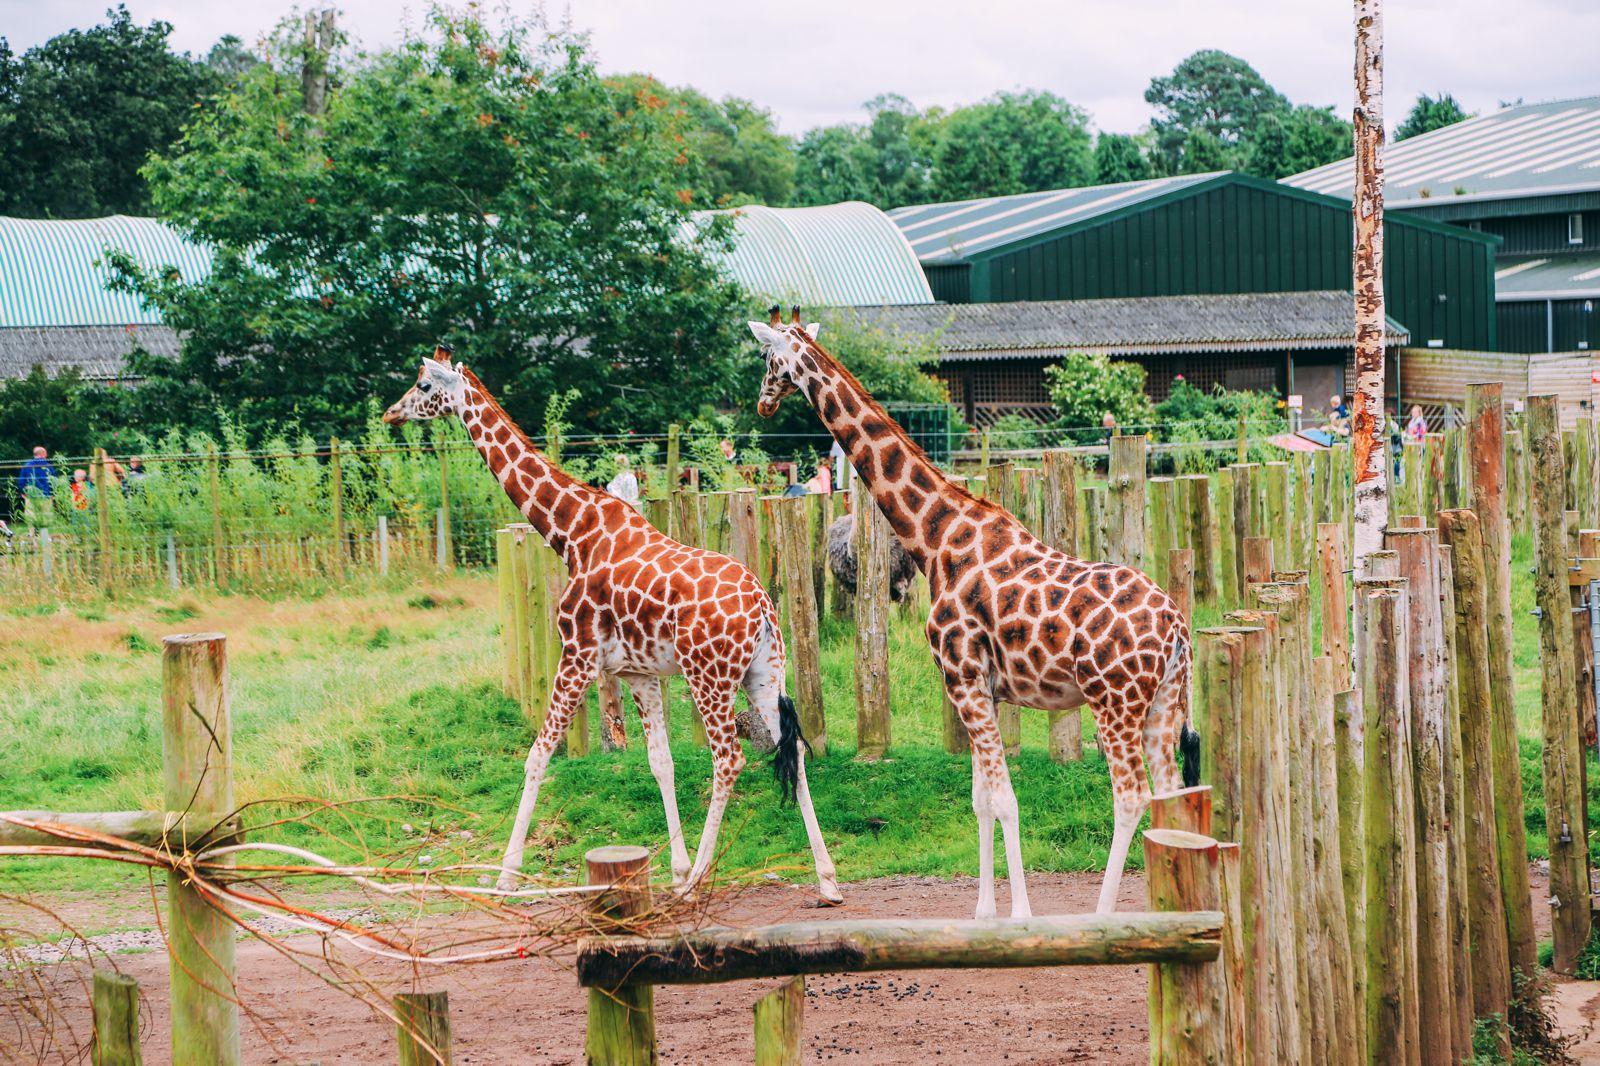 Safari In Scotland - The Photo Diary at Blair Drummond Safari and Adventure Park (37)